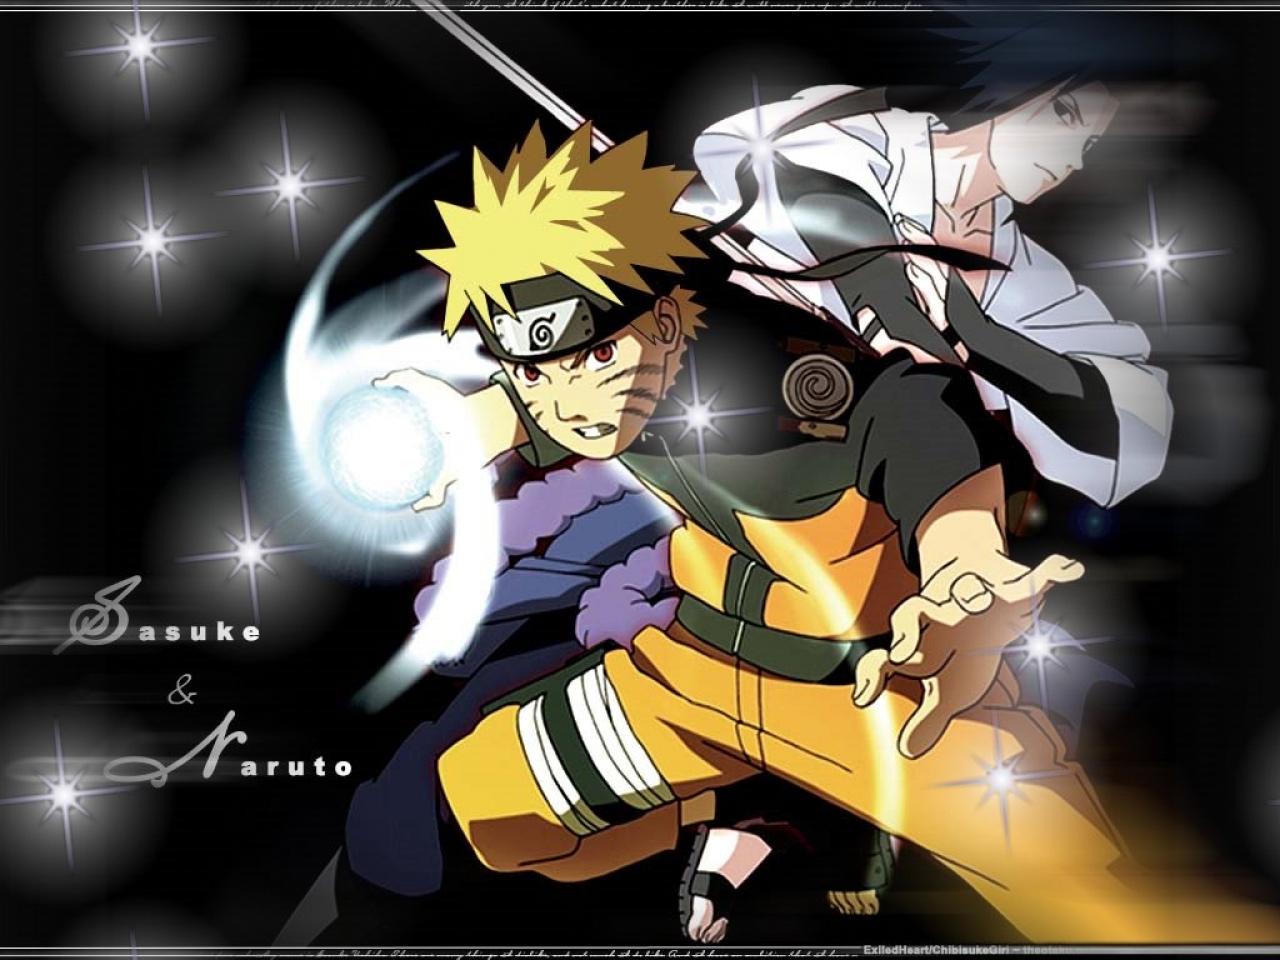 Most Inspiring Wallpaper Naruto Emotional - naruto-wallpaper-1280x960%2525255B1%2525255D  Pictures_801392.jpg